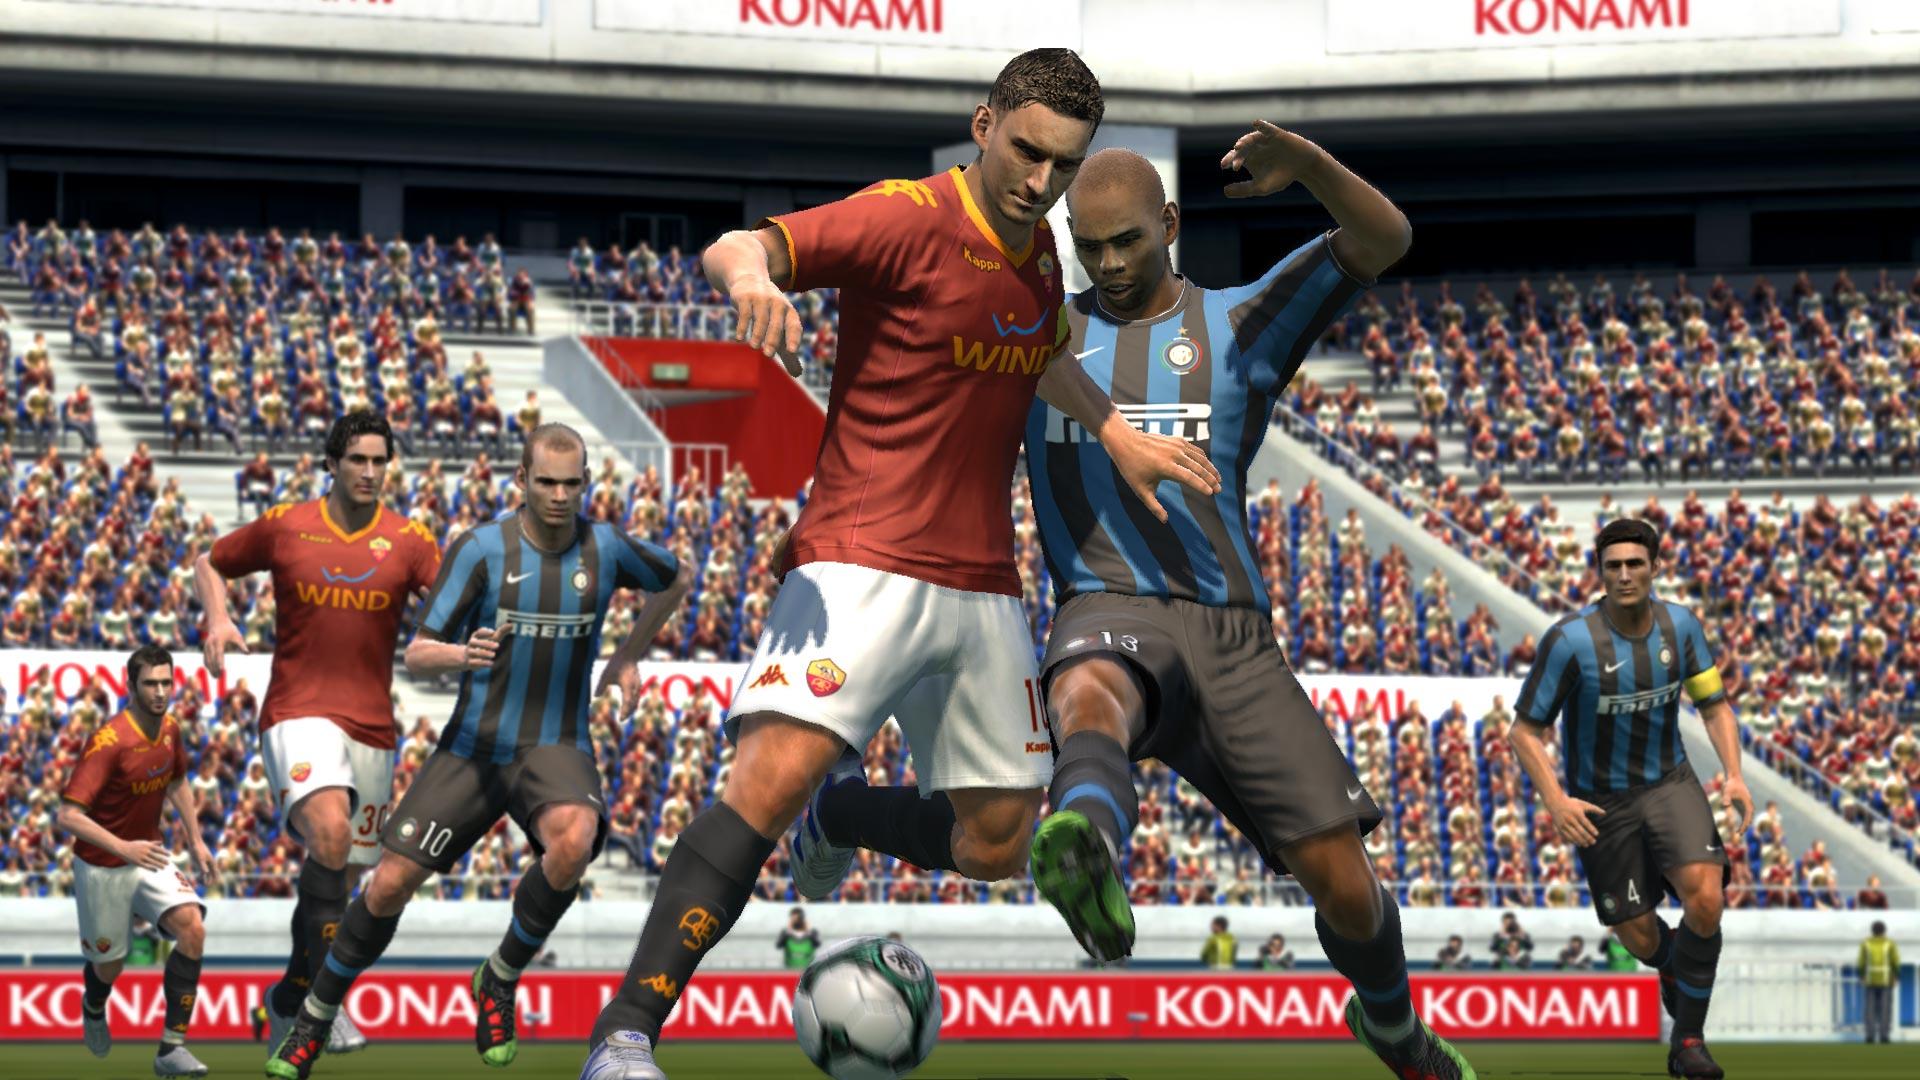 Así se juegan siete minutos de Pro Evolution Soccer 2011 [ESHVANSTAIGAH!]